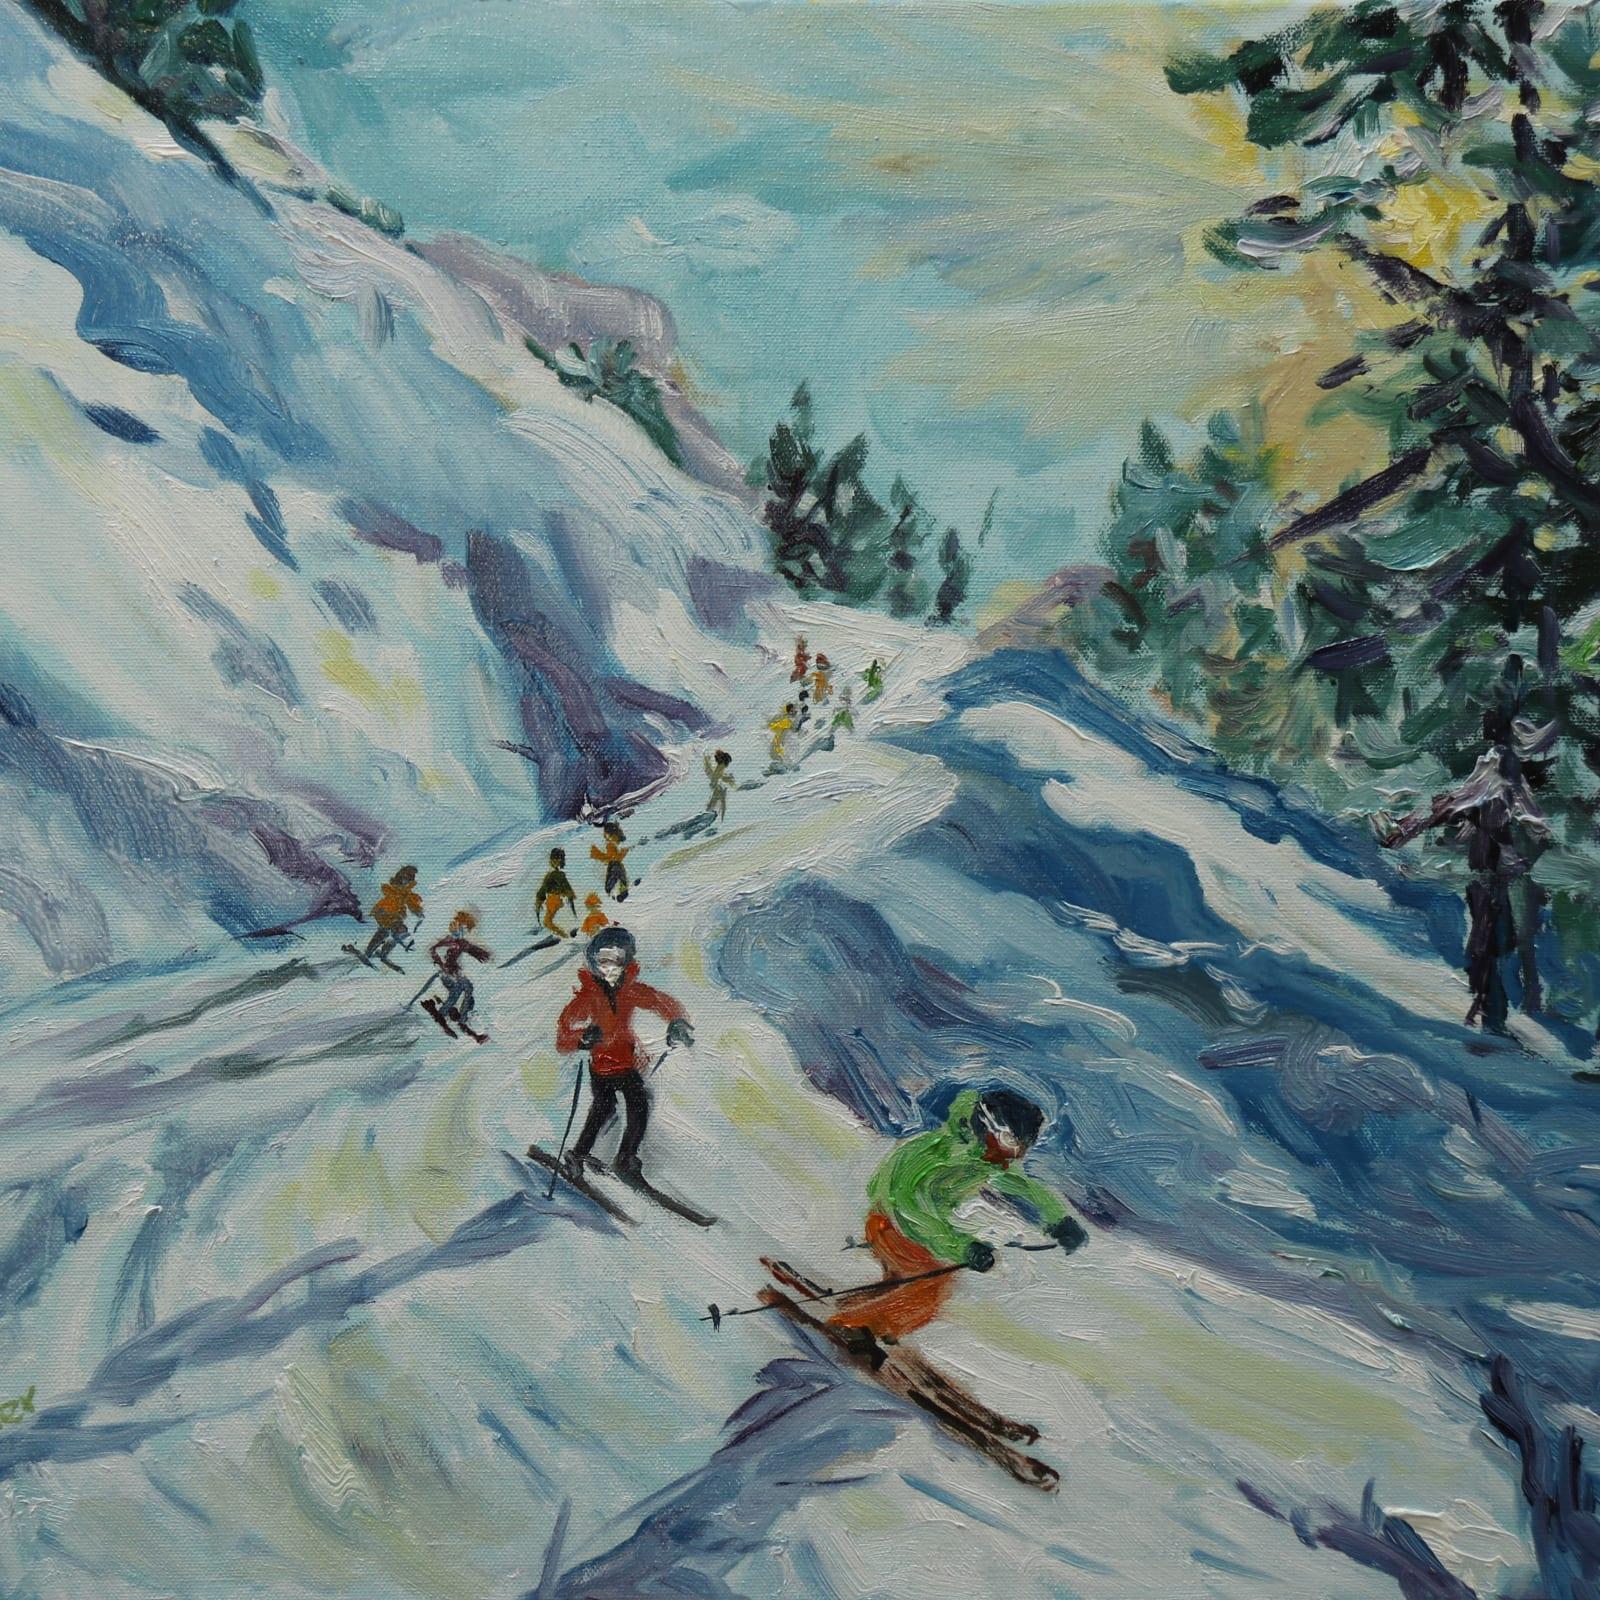 Fi Katzler  LAST RUN HOME  Oil on canvas  18 x 22 in. 45.72 x 55.88 cm